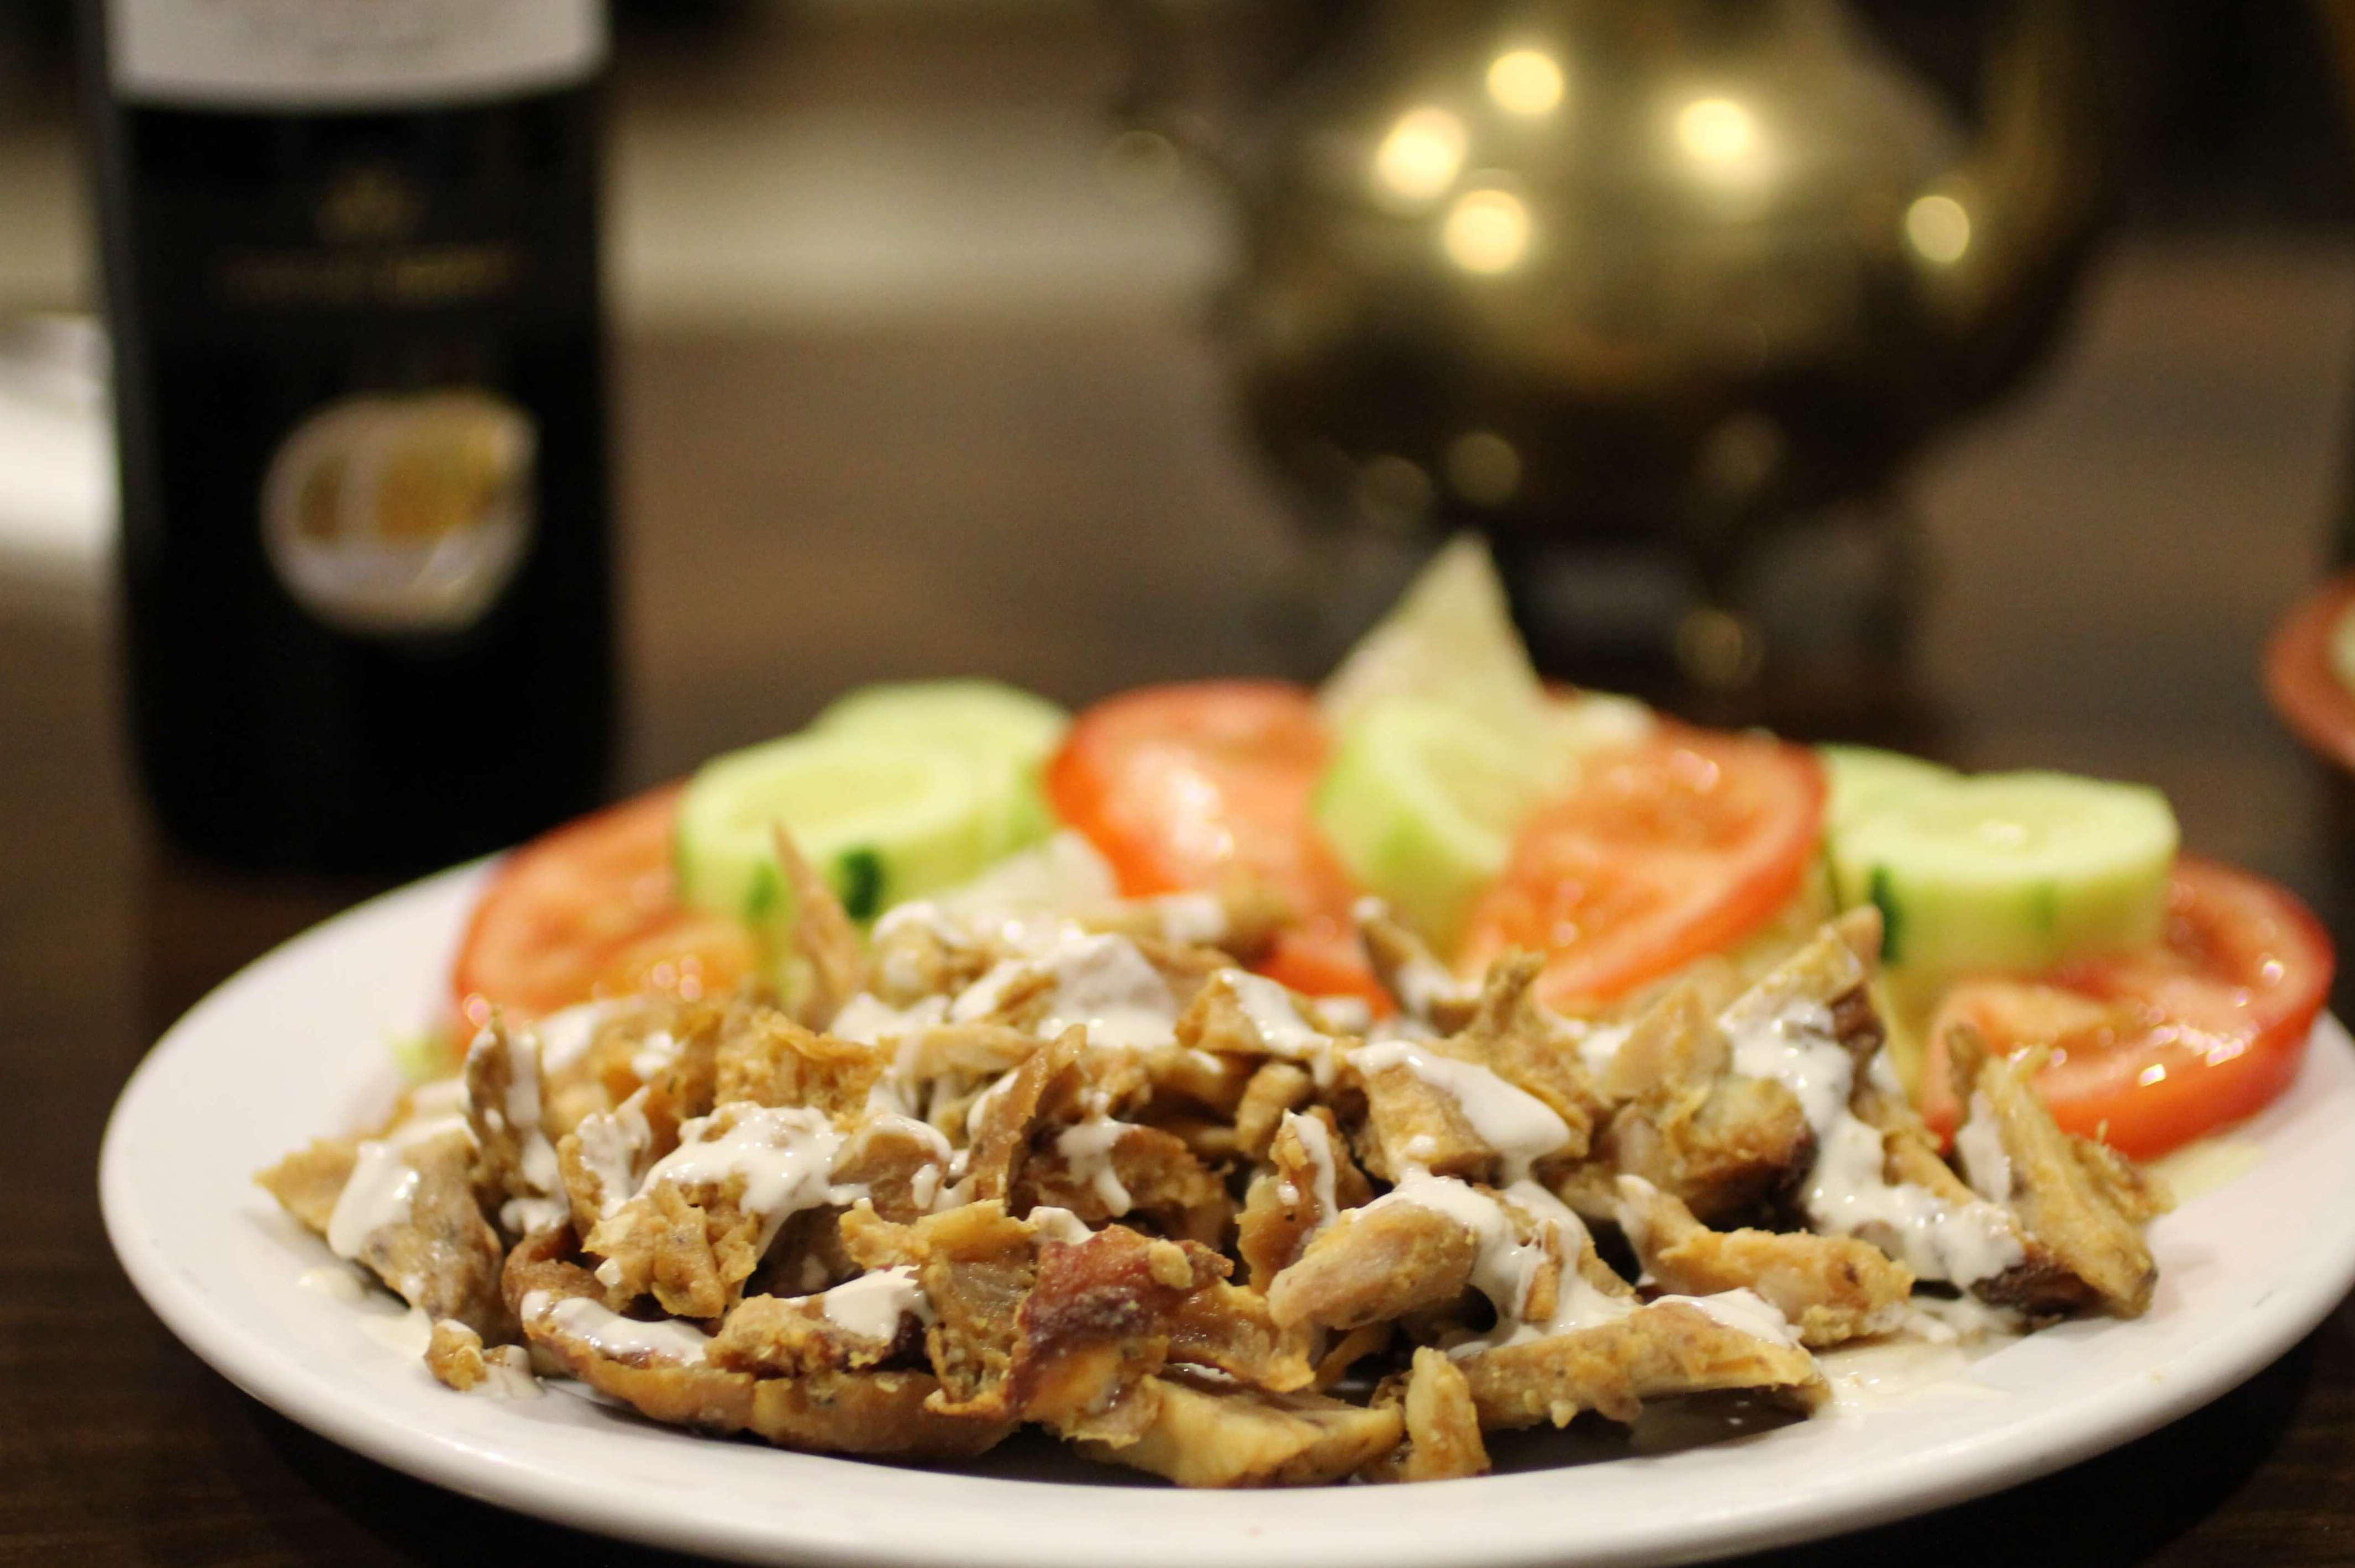 Shawarma de pollo con ensalada - Restaurante Mataró - Les Mil i Una Nits